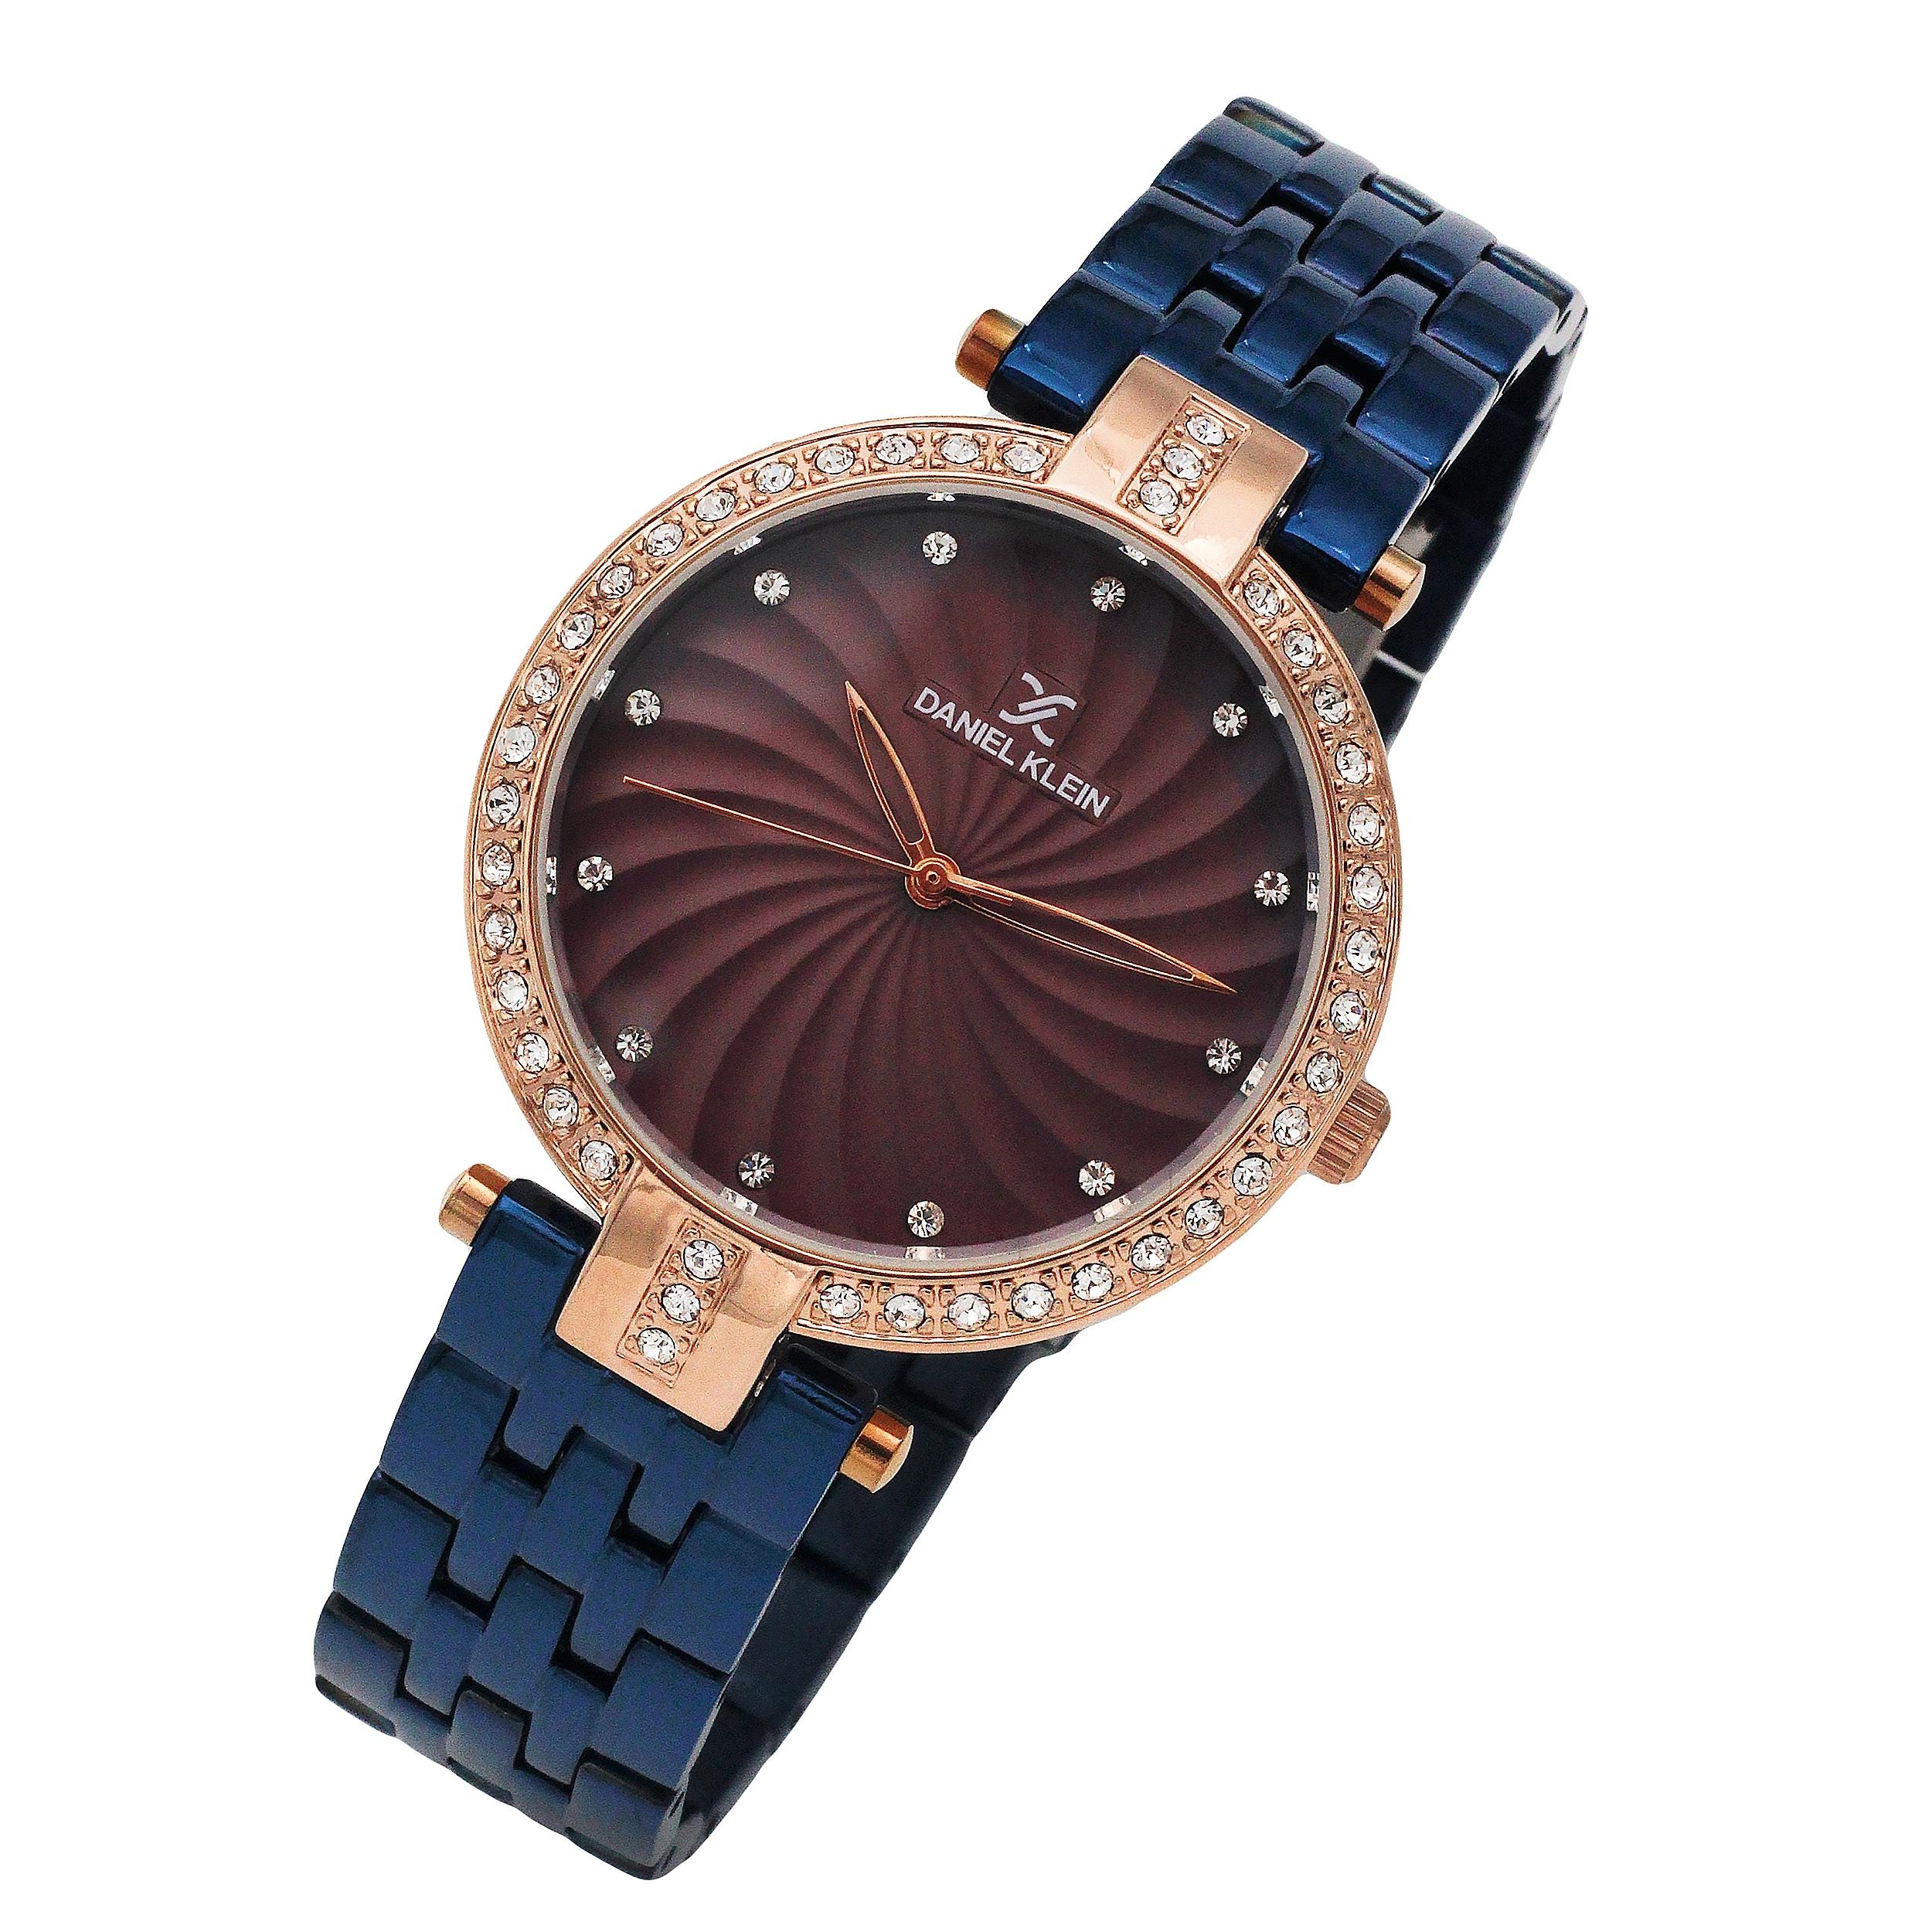 خرید و قیمت                      ساعت مچی  زنانه دنیل کلین مدل DK12183-6